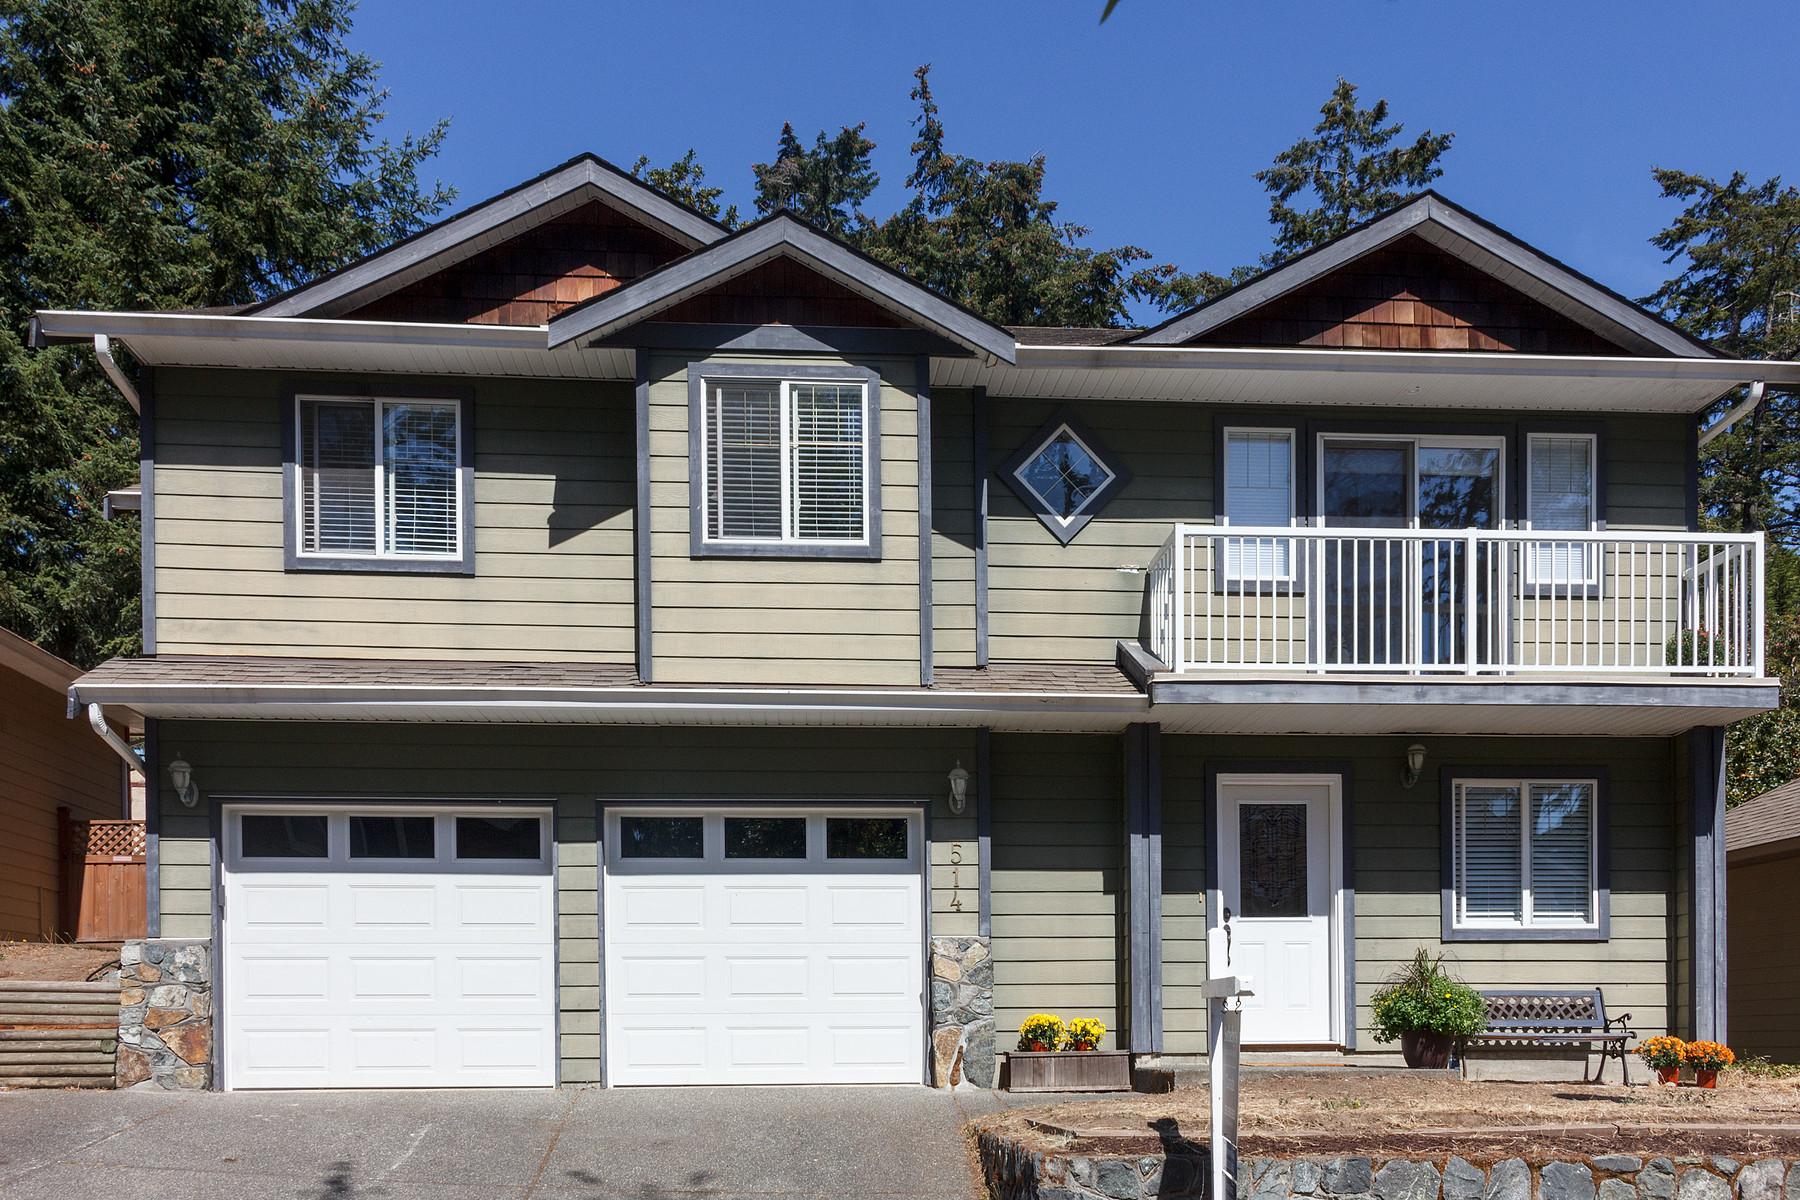 Casa para uma família para Venda às Affordable Langford Listing 514 Selwyn Oaks Pl. Victoria, Columbia Britanica, V9B 6K7 Canadá